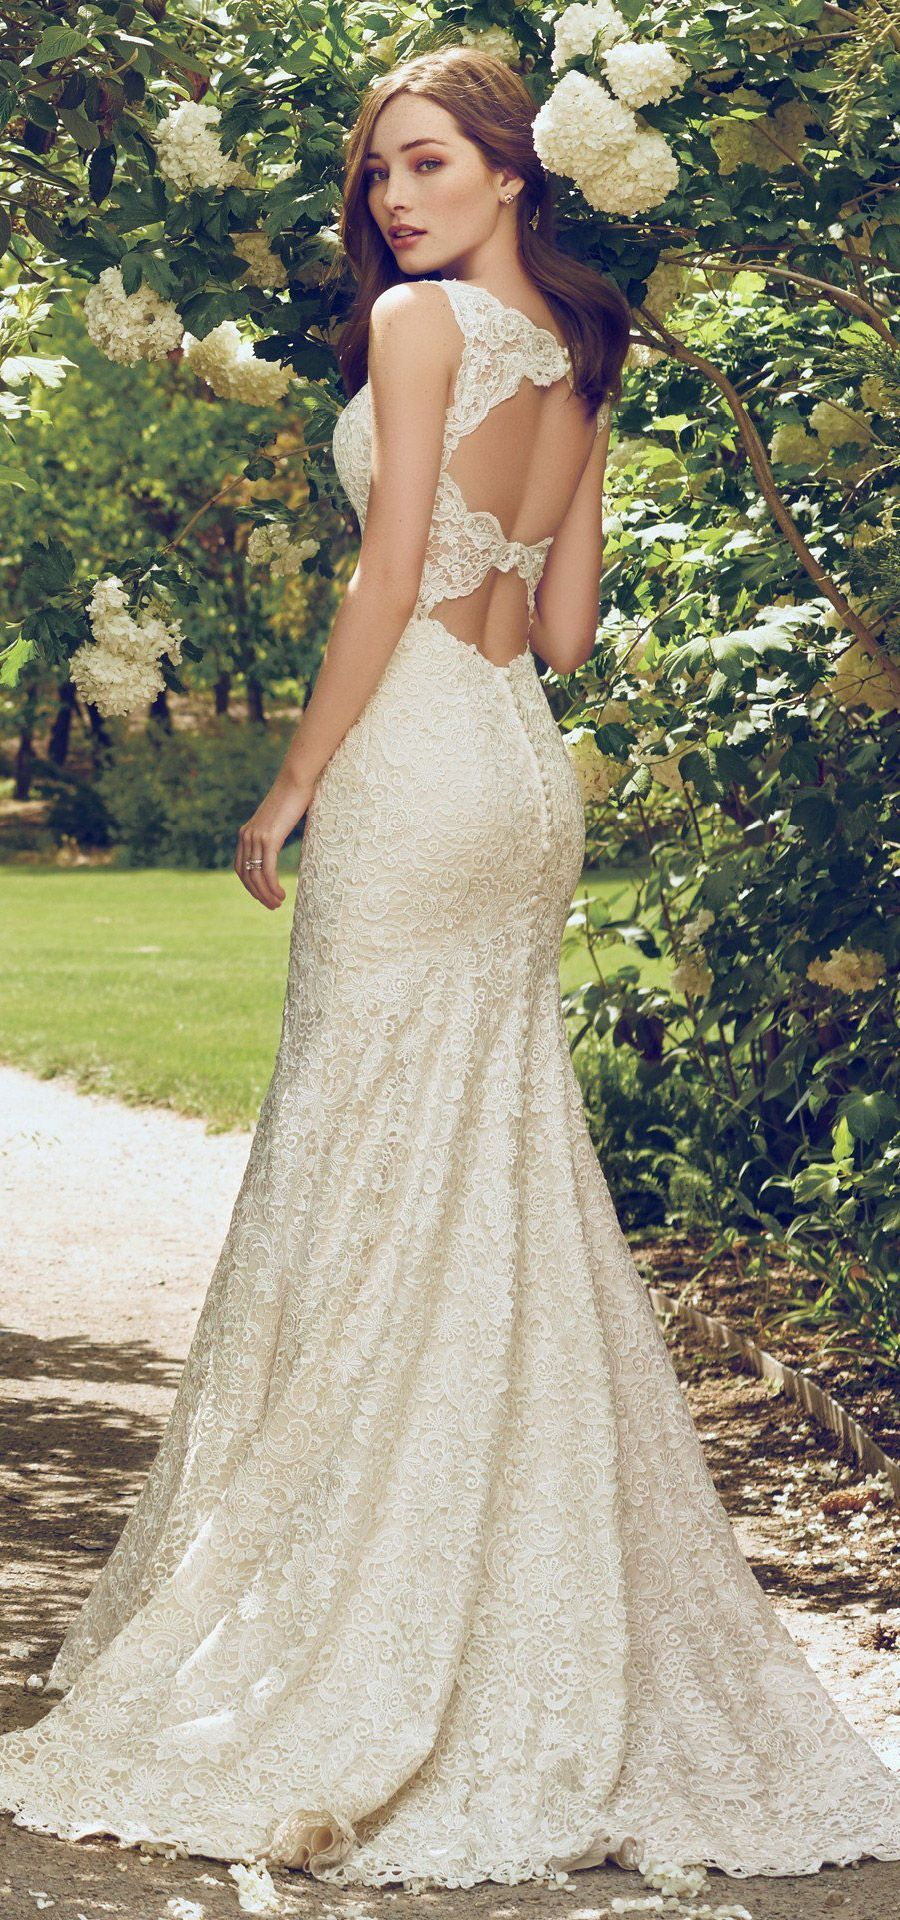 Rebecca ingram wedding hope sleeveless lace straps vneck beaded